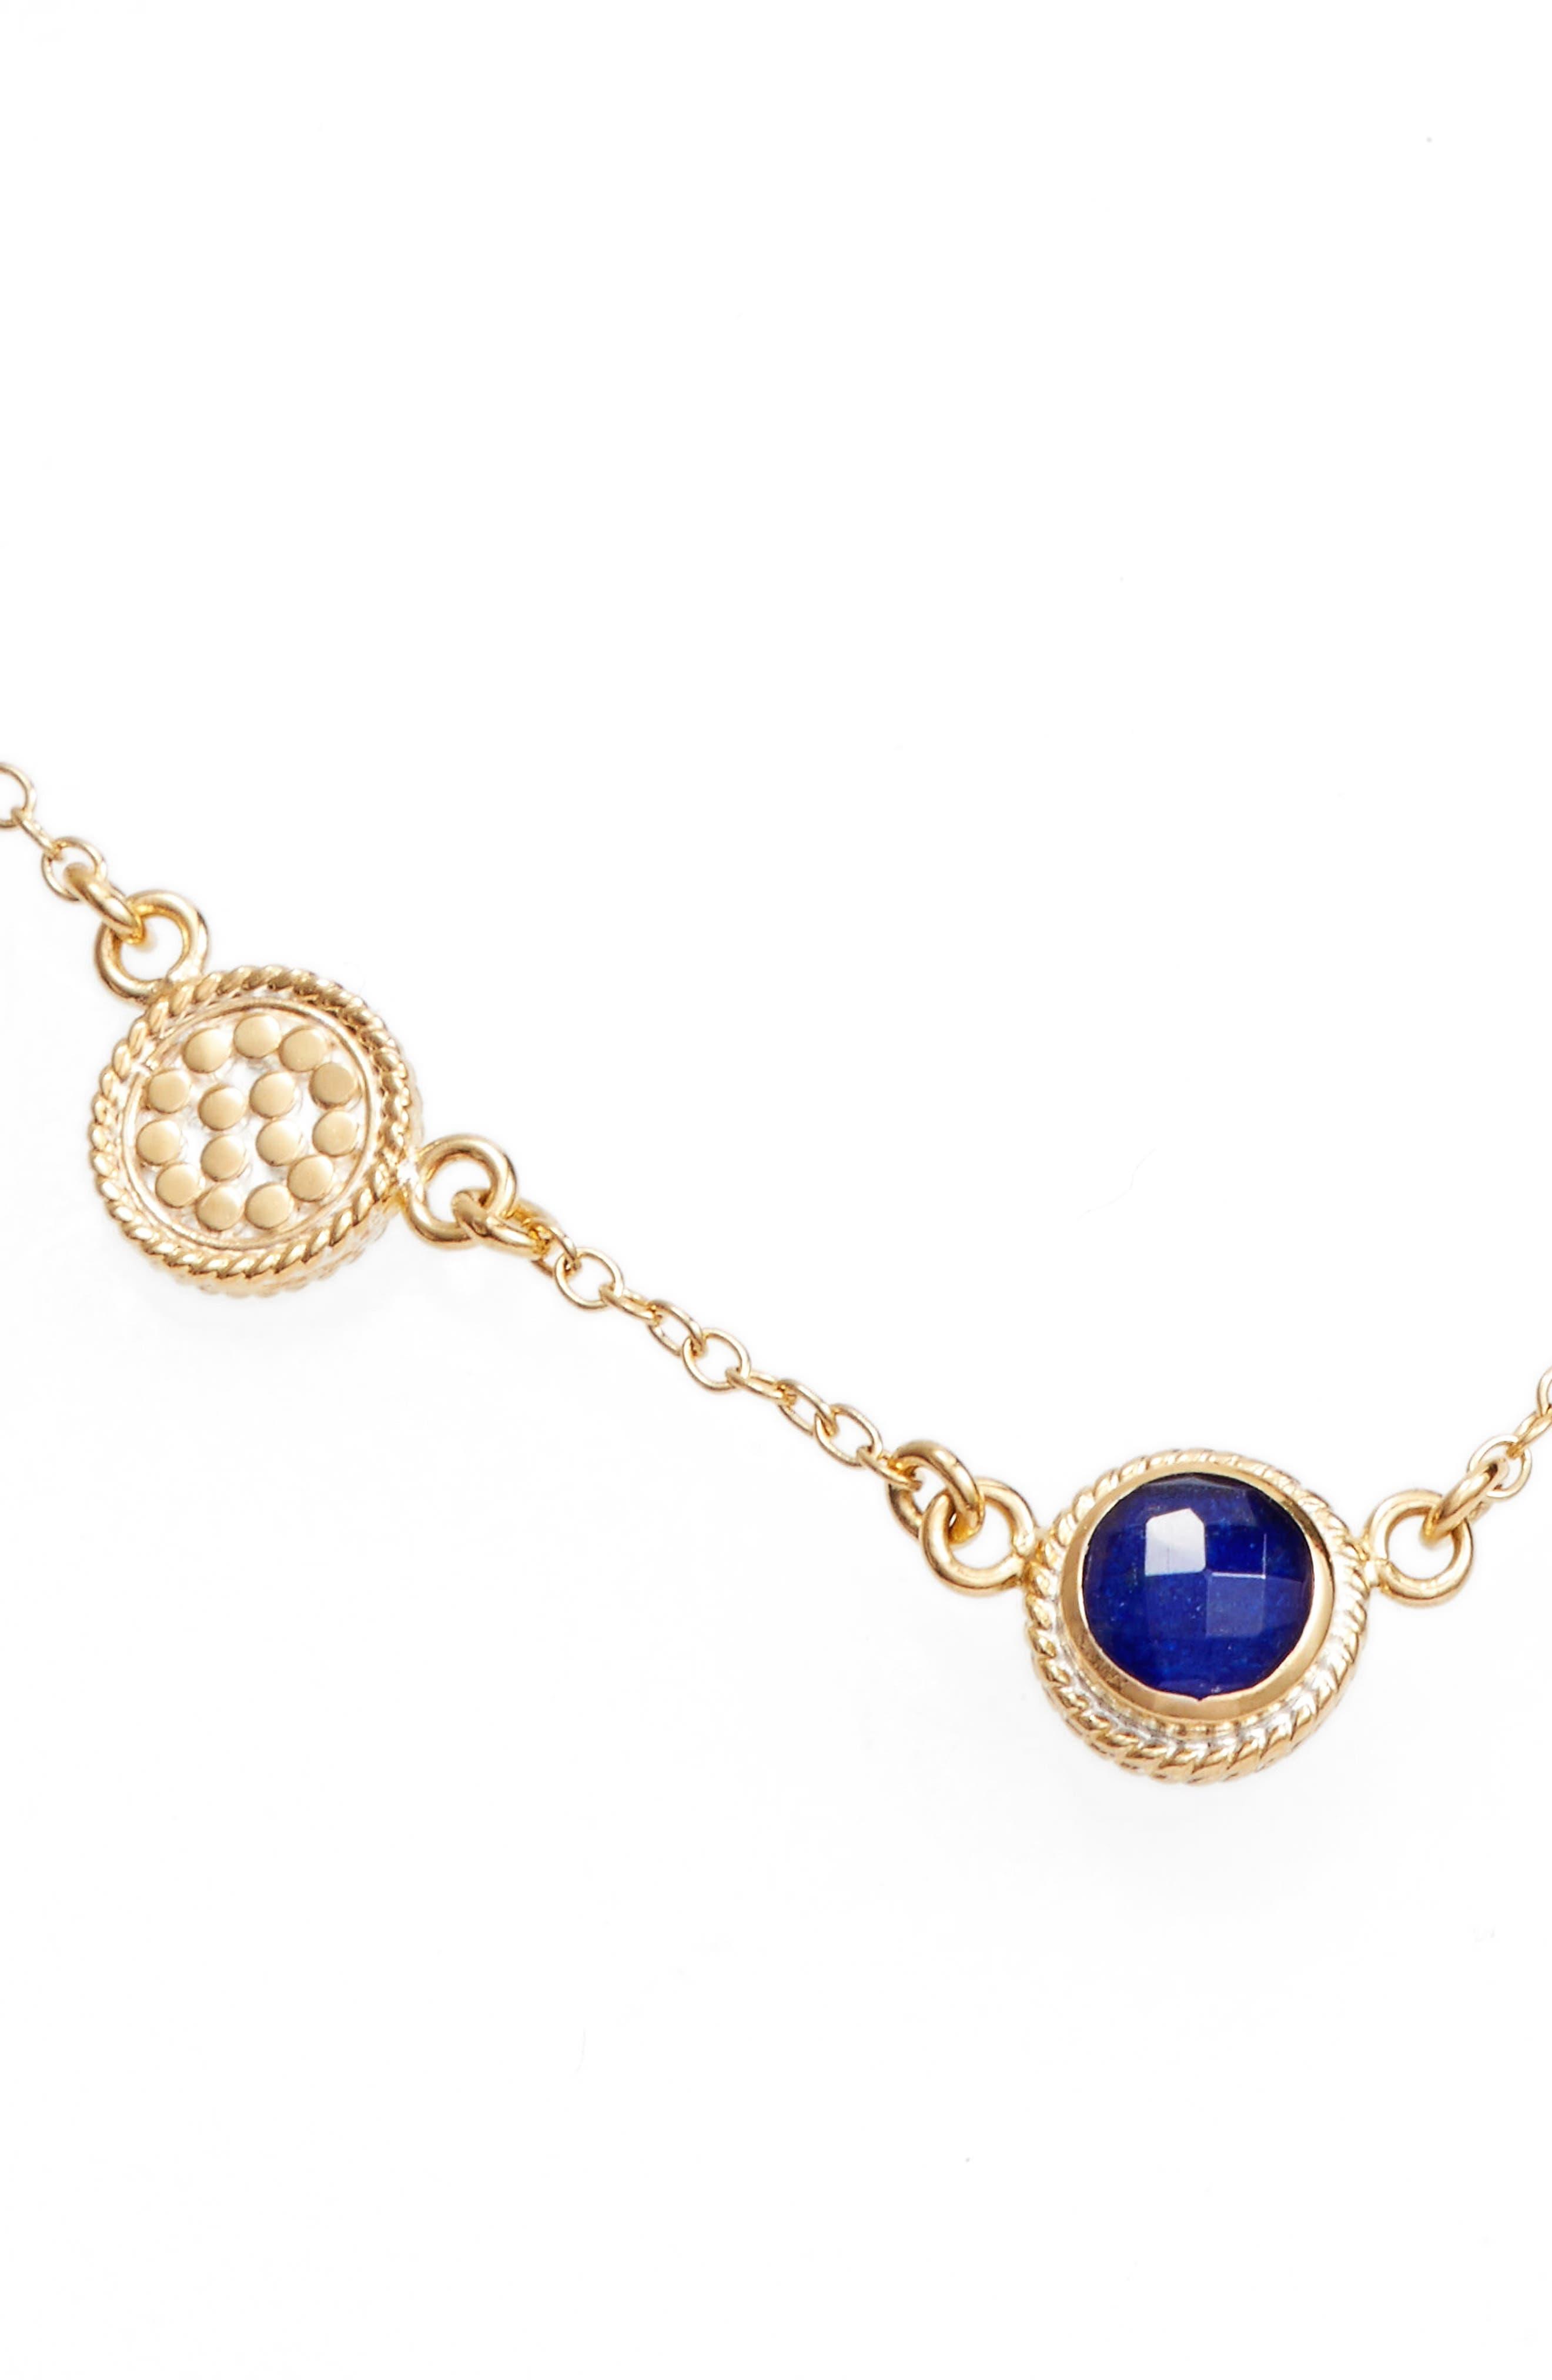 Semiprecious Stone Station Necklace,                             Main thumbnail 1, color,                             BLUE LAPIS